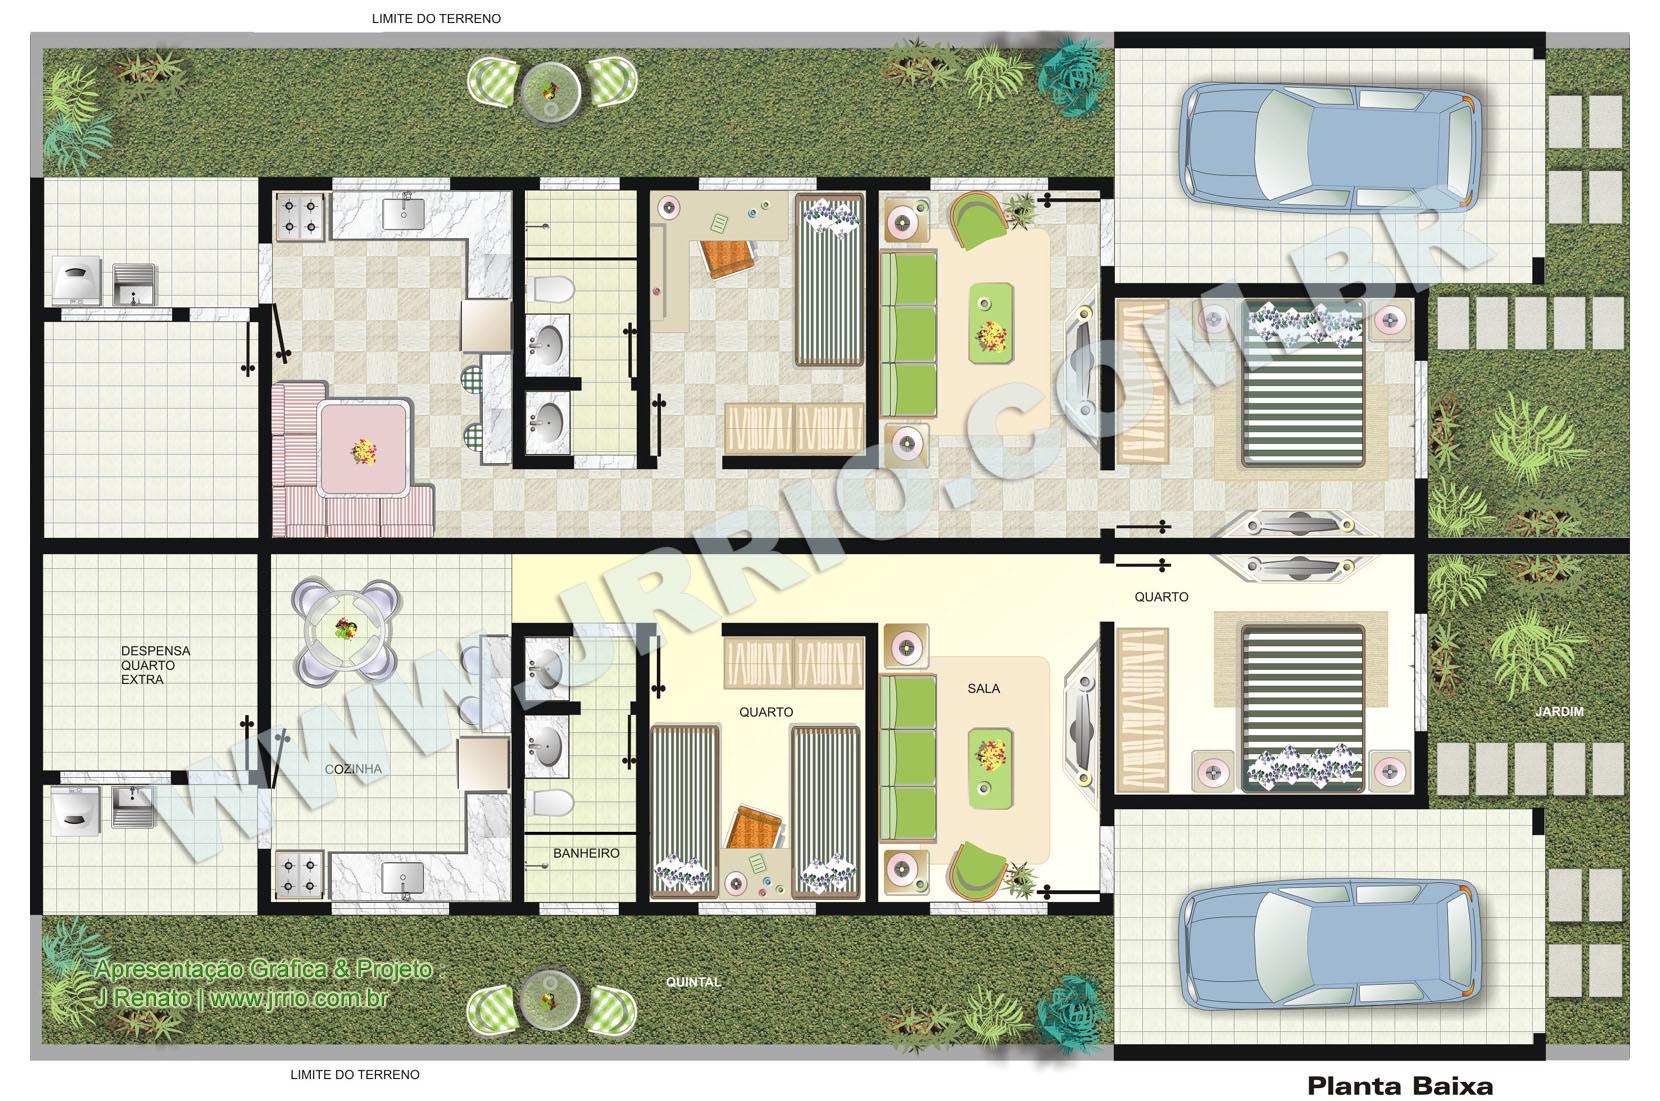 Plantas de casas geminadas t rreas for Modelo de casa x dentro